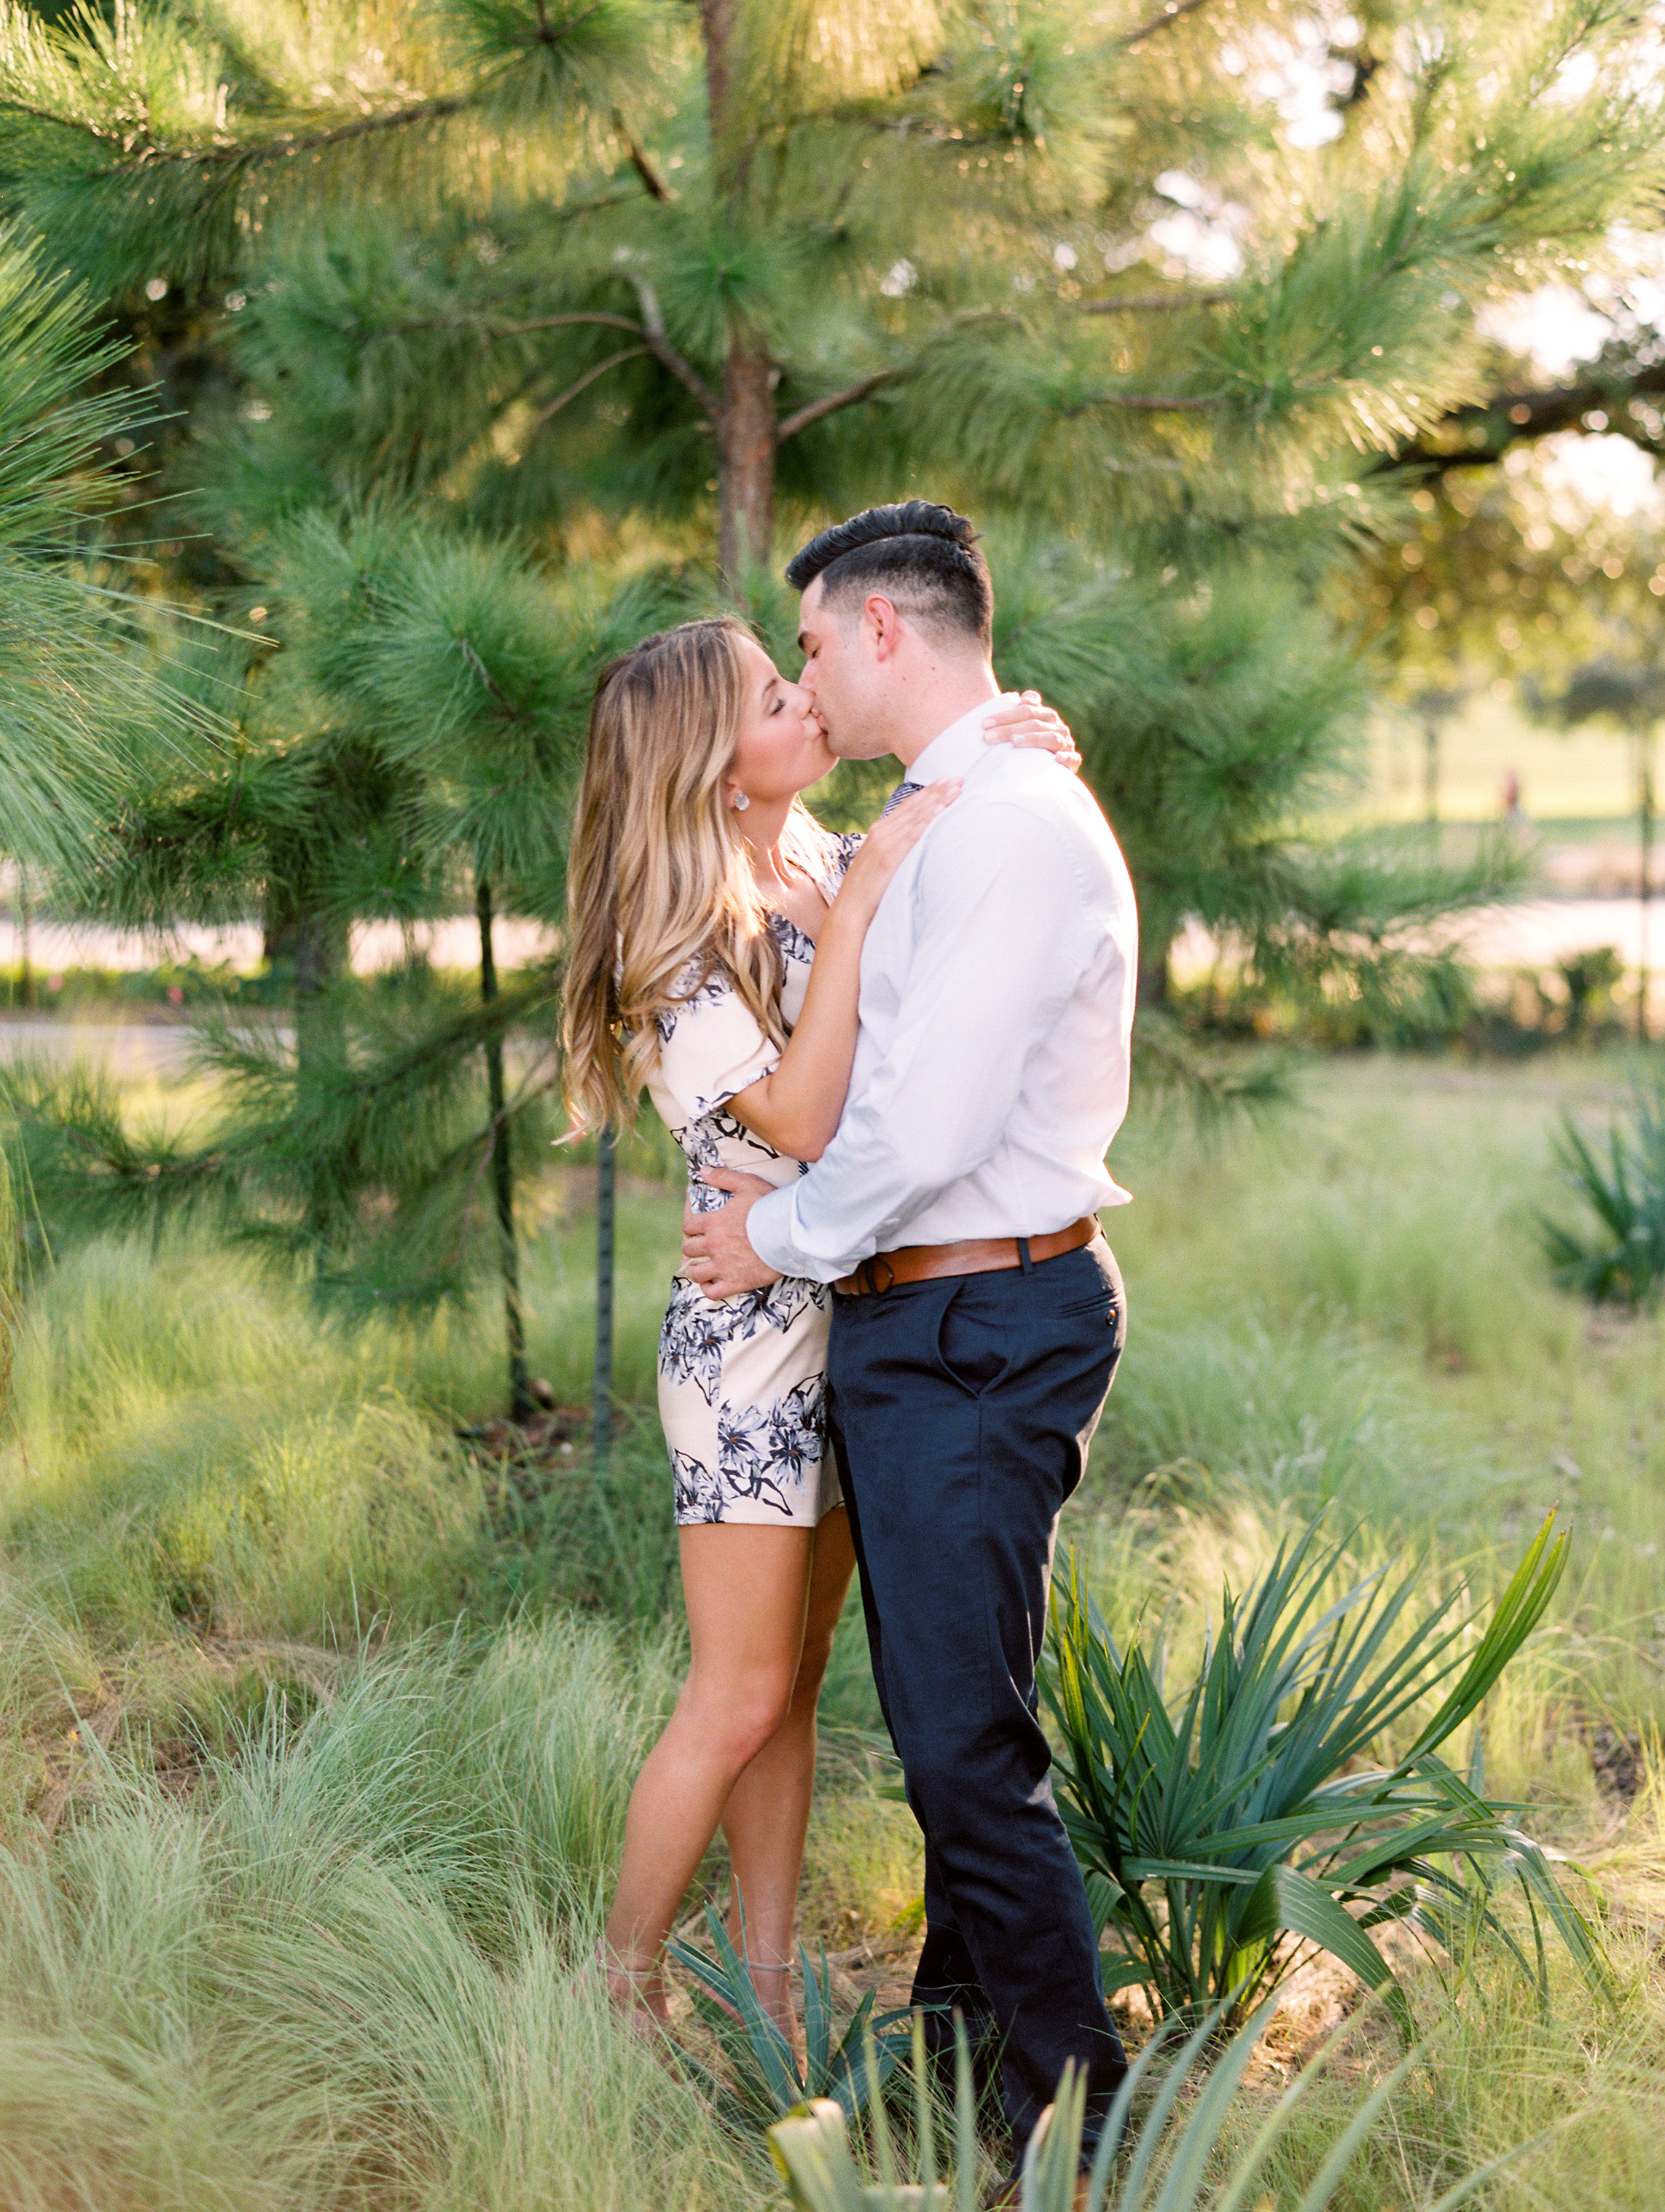 Dana-Fernandez-Photography-Houston-Engagement-Wedding-Film-Photographer-14.jpg